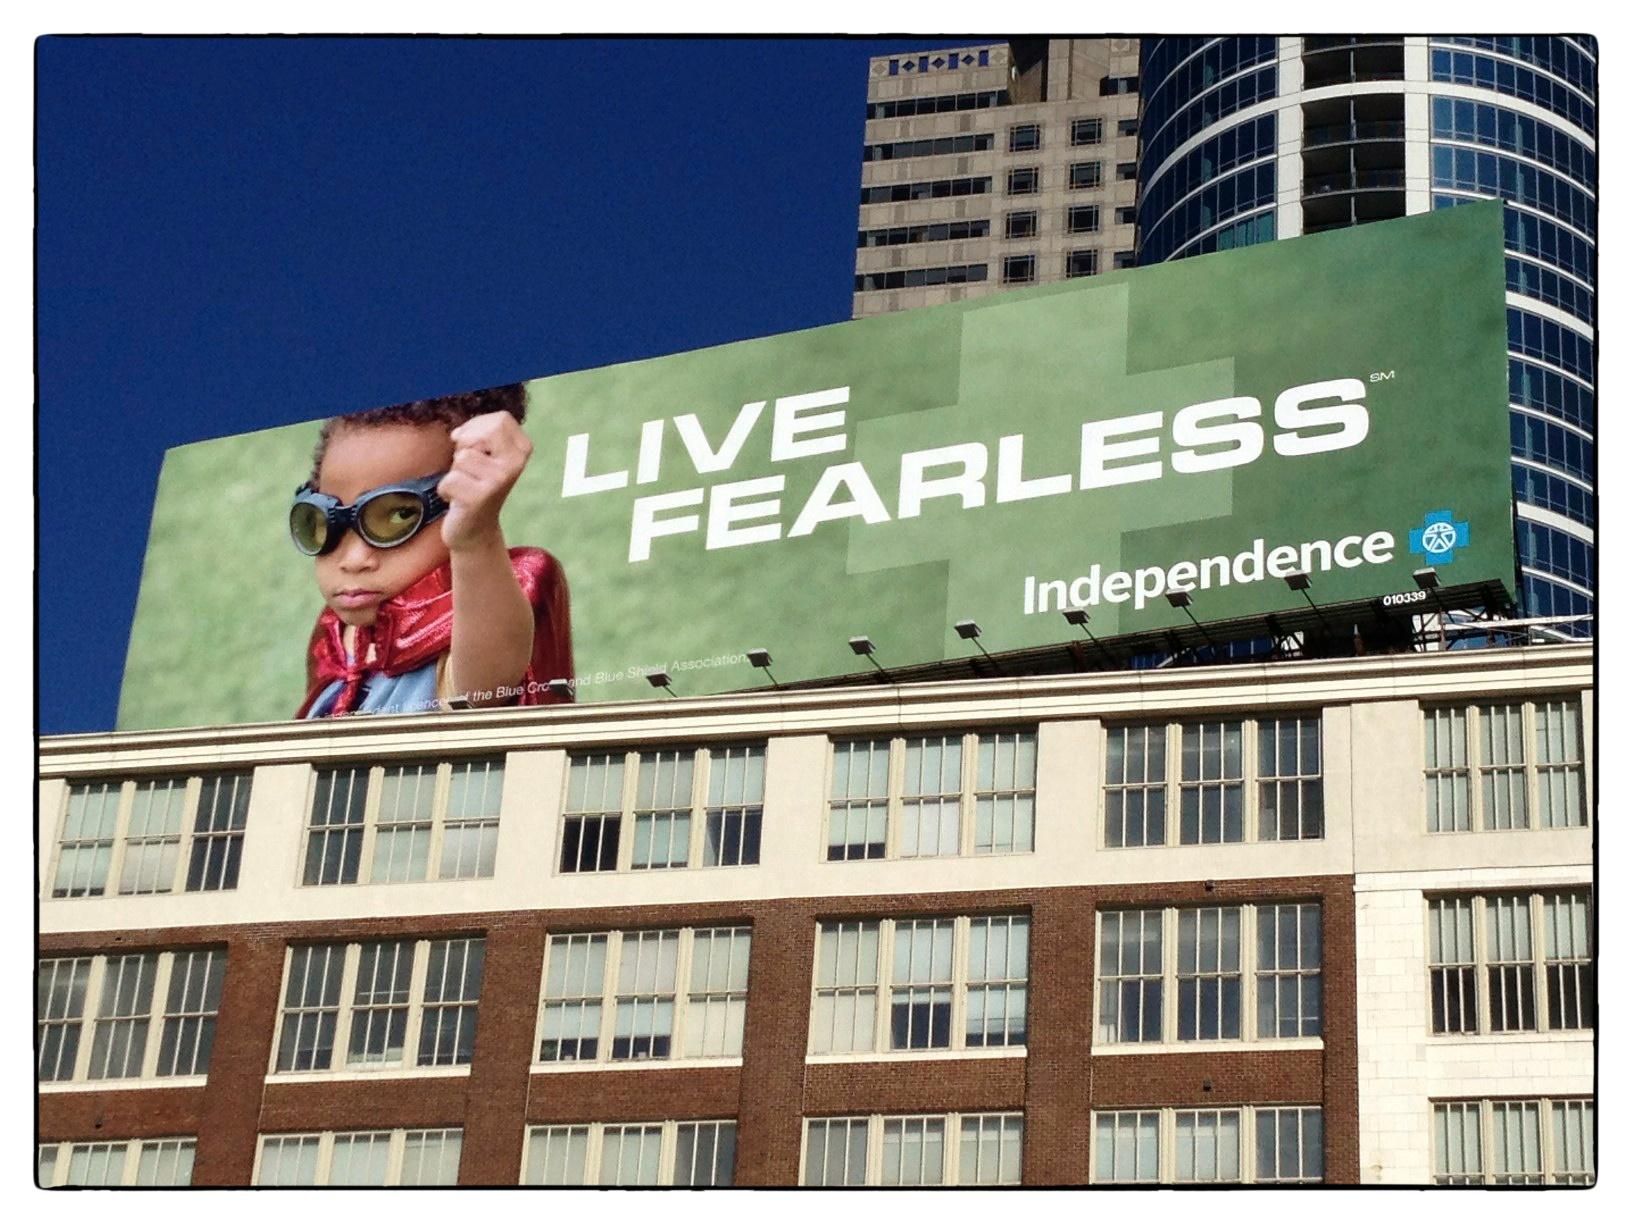 Shot at the corner of Market and 22nd Streets in Philadelphia, September 3, 2013.